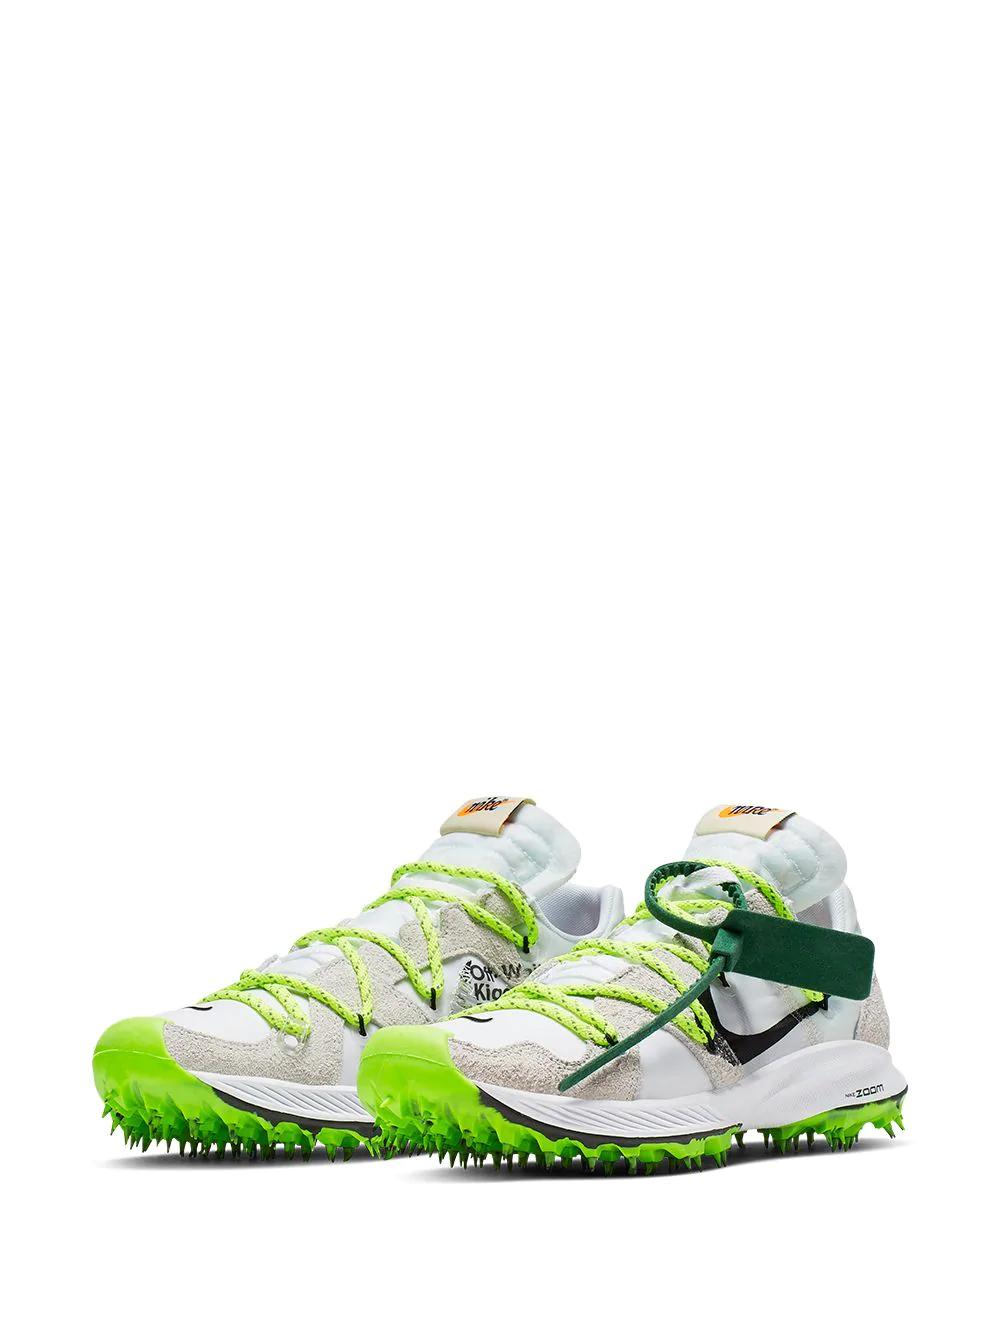 NIKE x Off-White Zoom Terra Kiger 5 sneakers, 950лв.